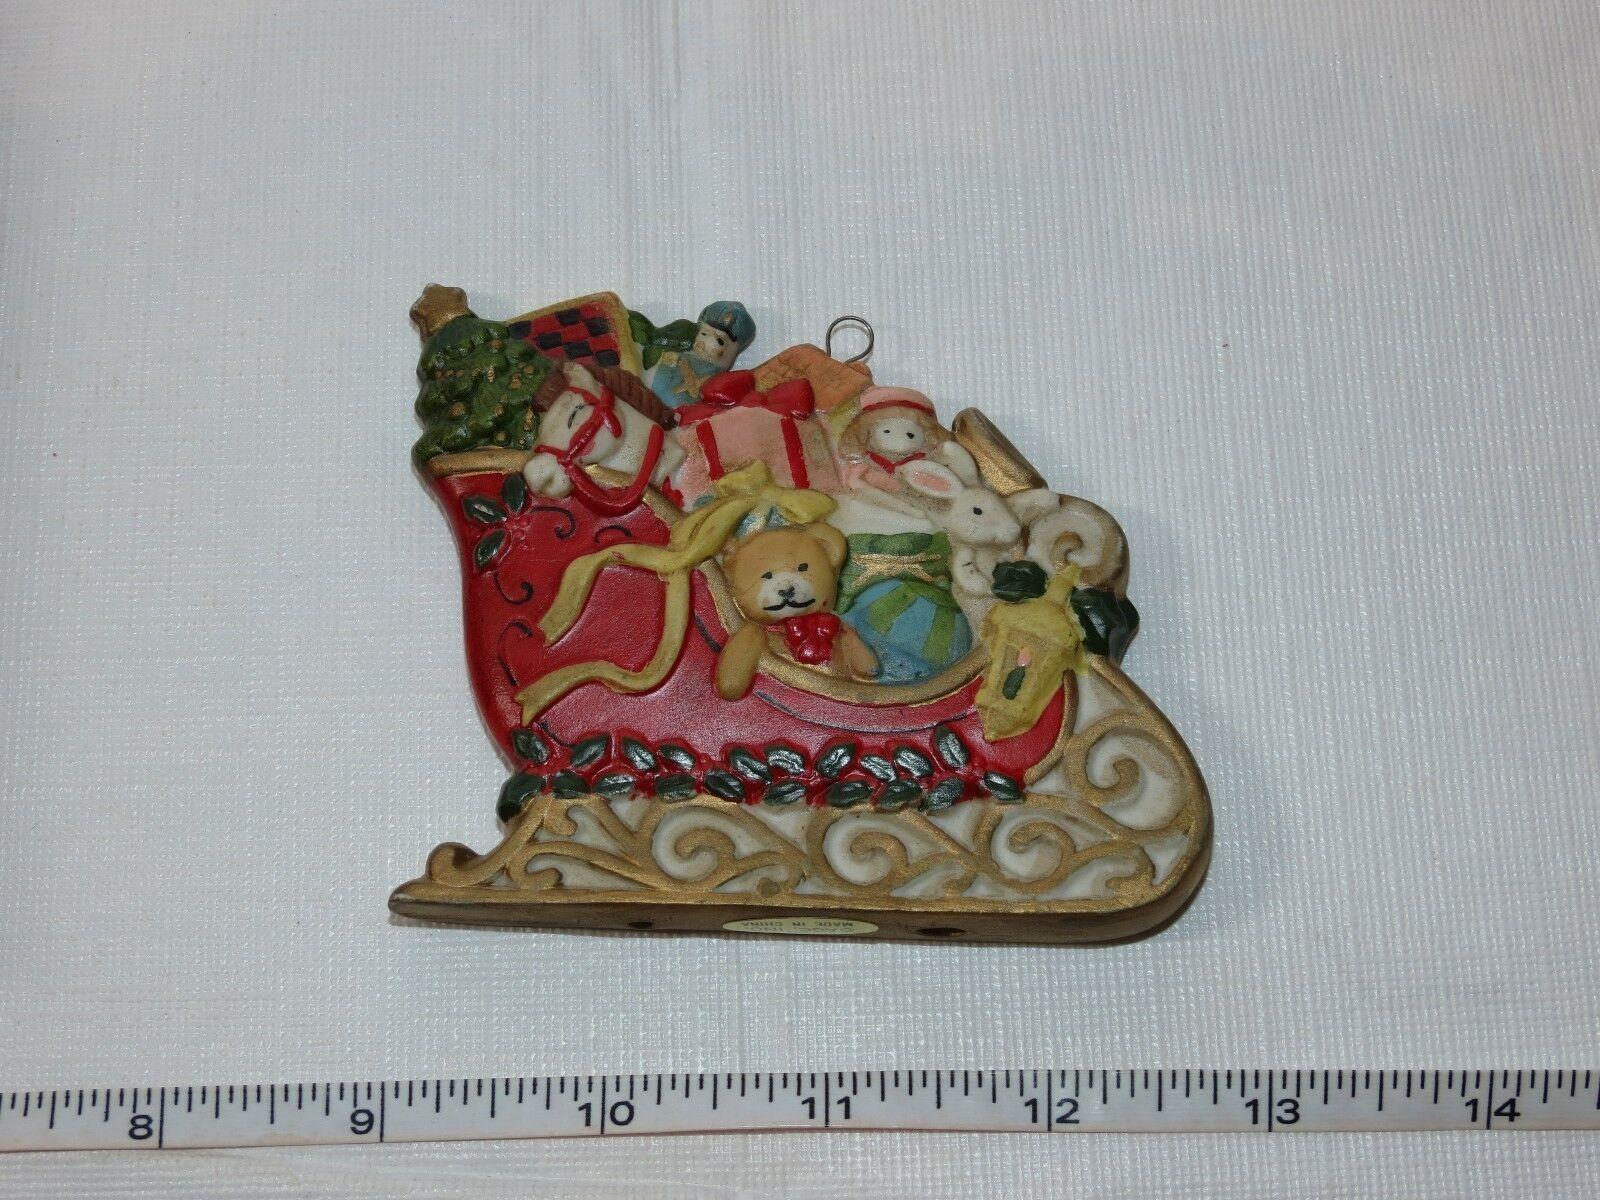 Carlton Cards Heirloom Collection A Sleighful of Joys Christmas Ornament